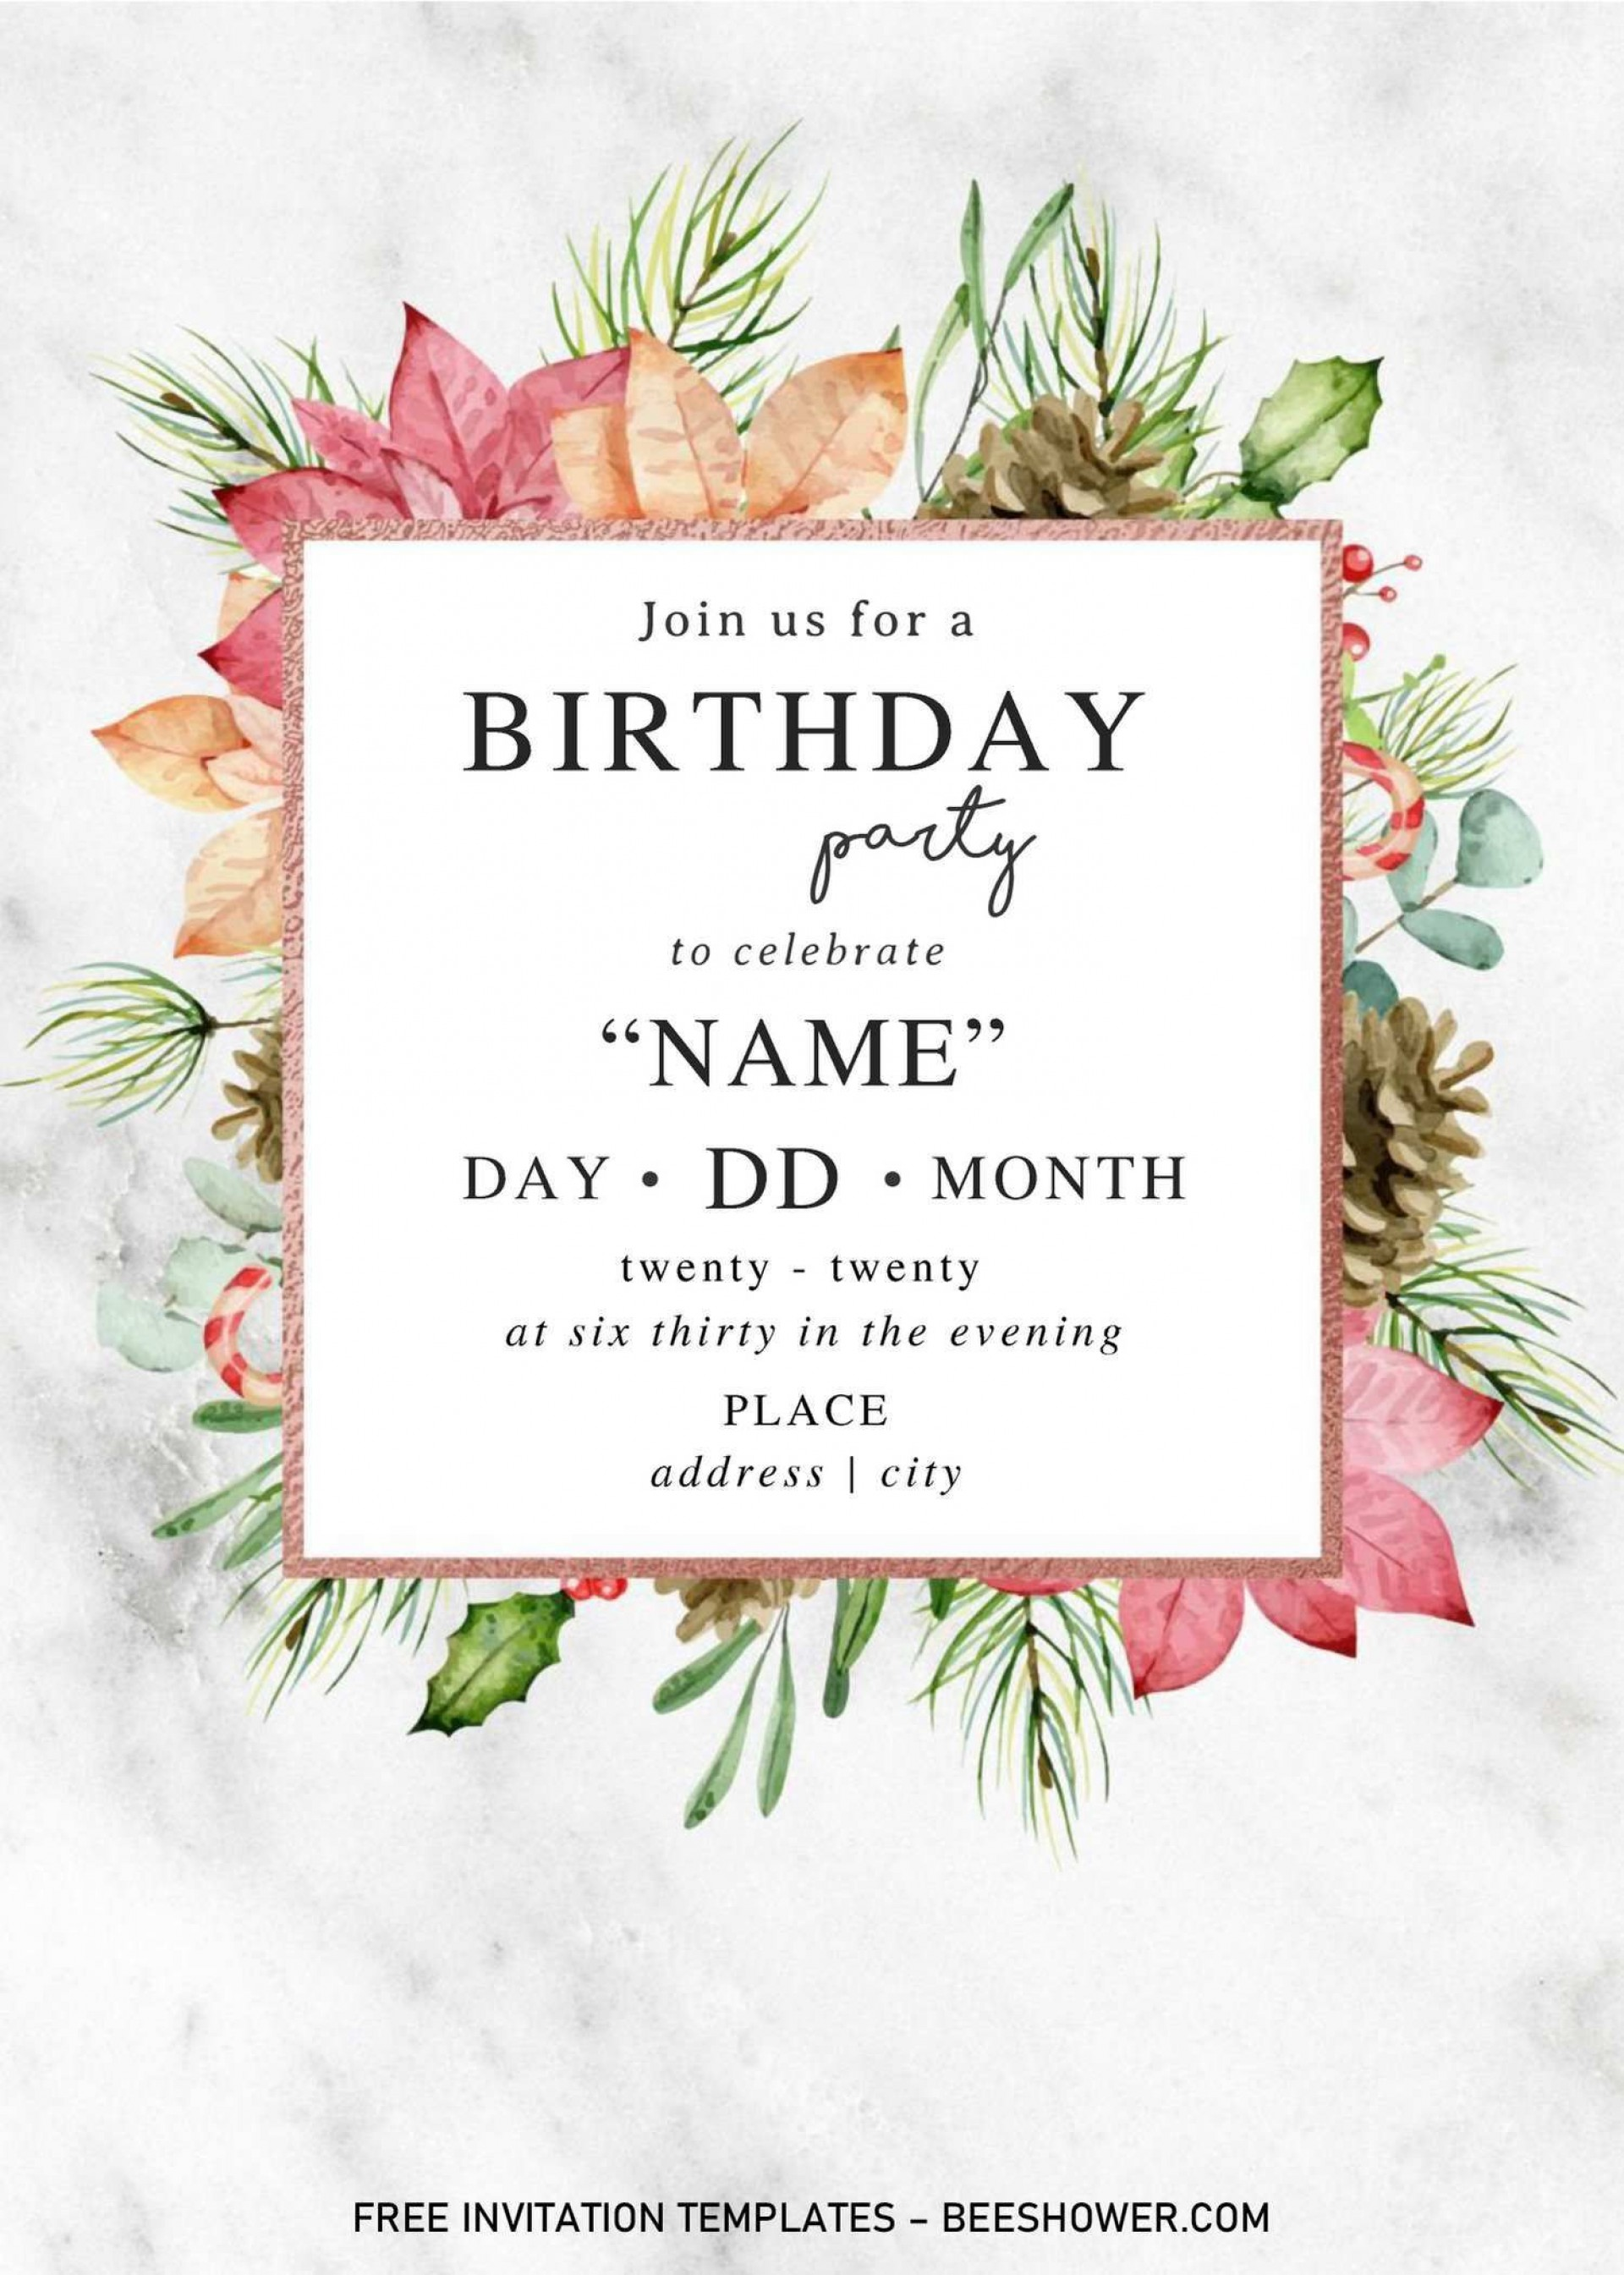 007 Striking Microsoft Word Invitation Template Baby Shower Picture  Free Editable Invite1920